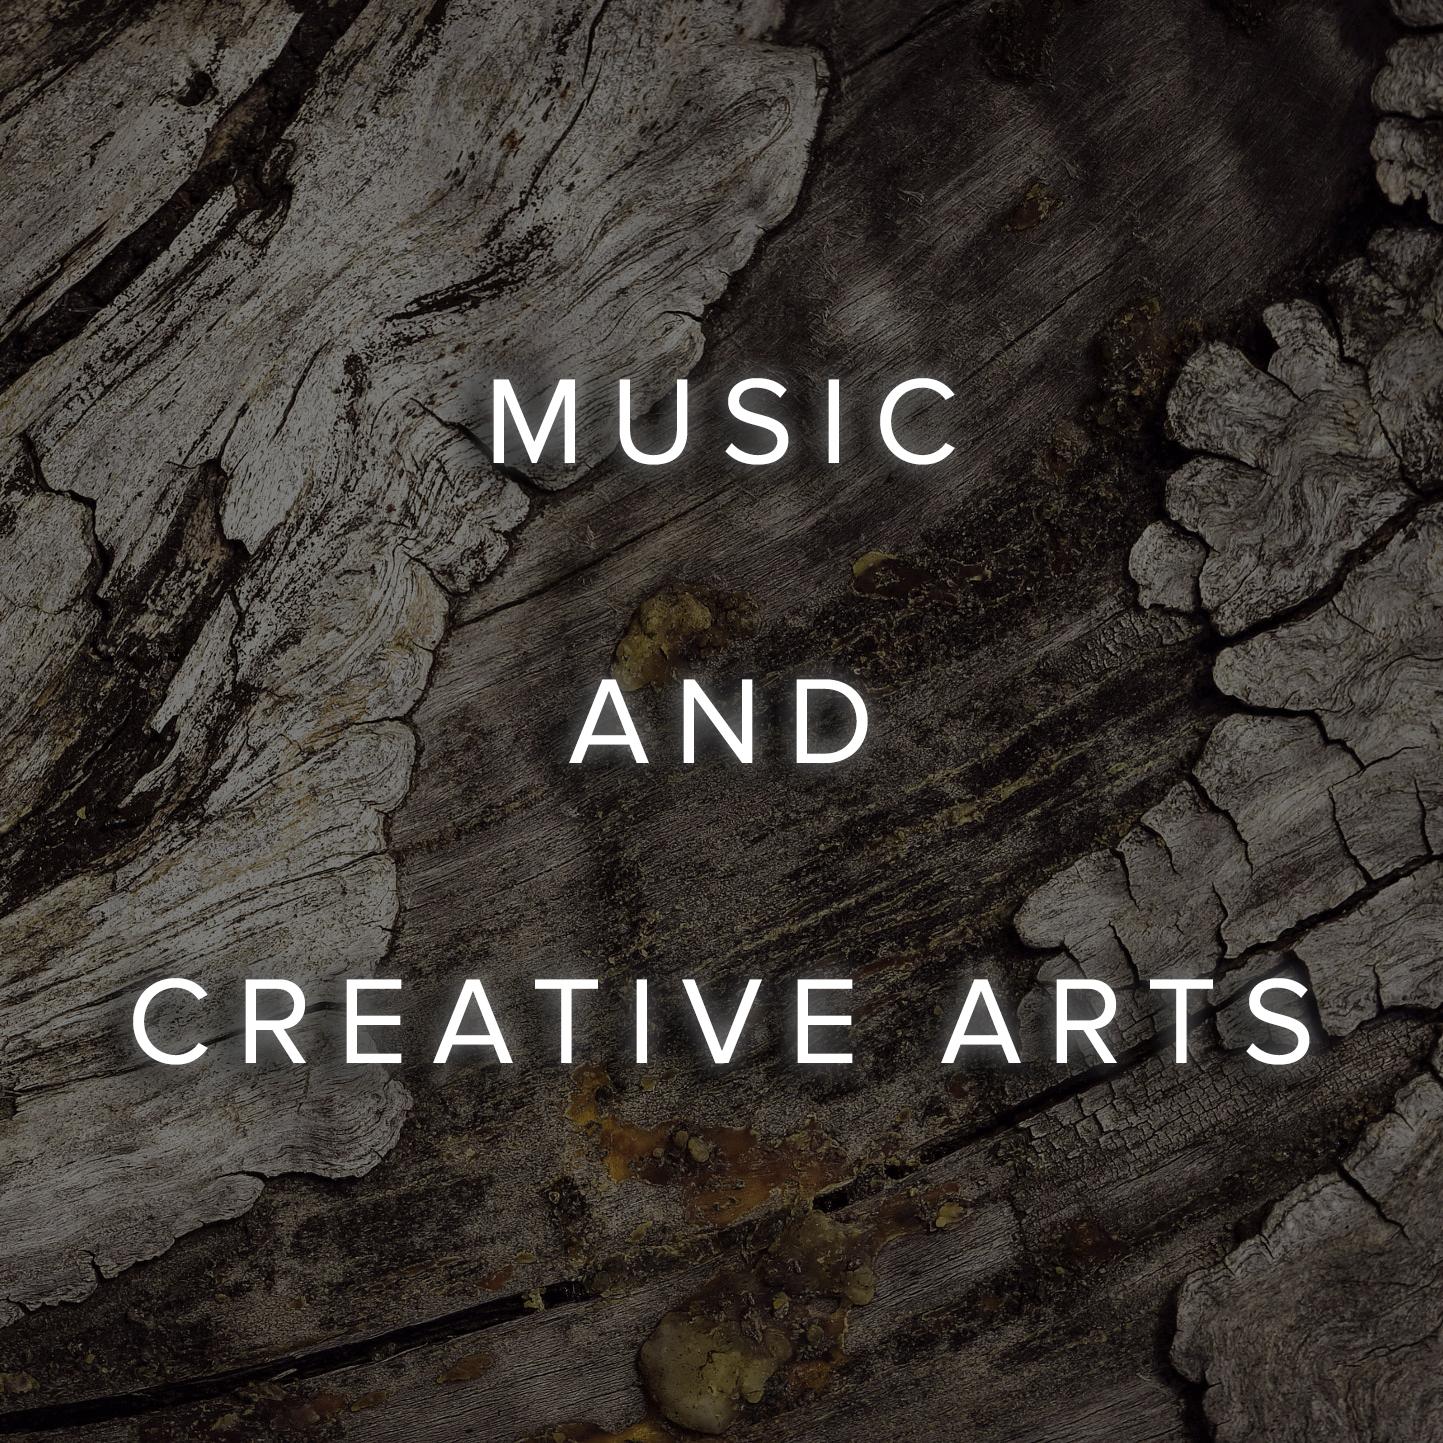 musicarts.jpg